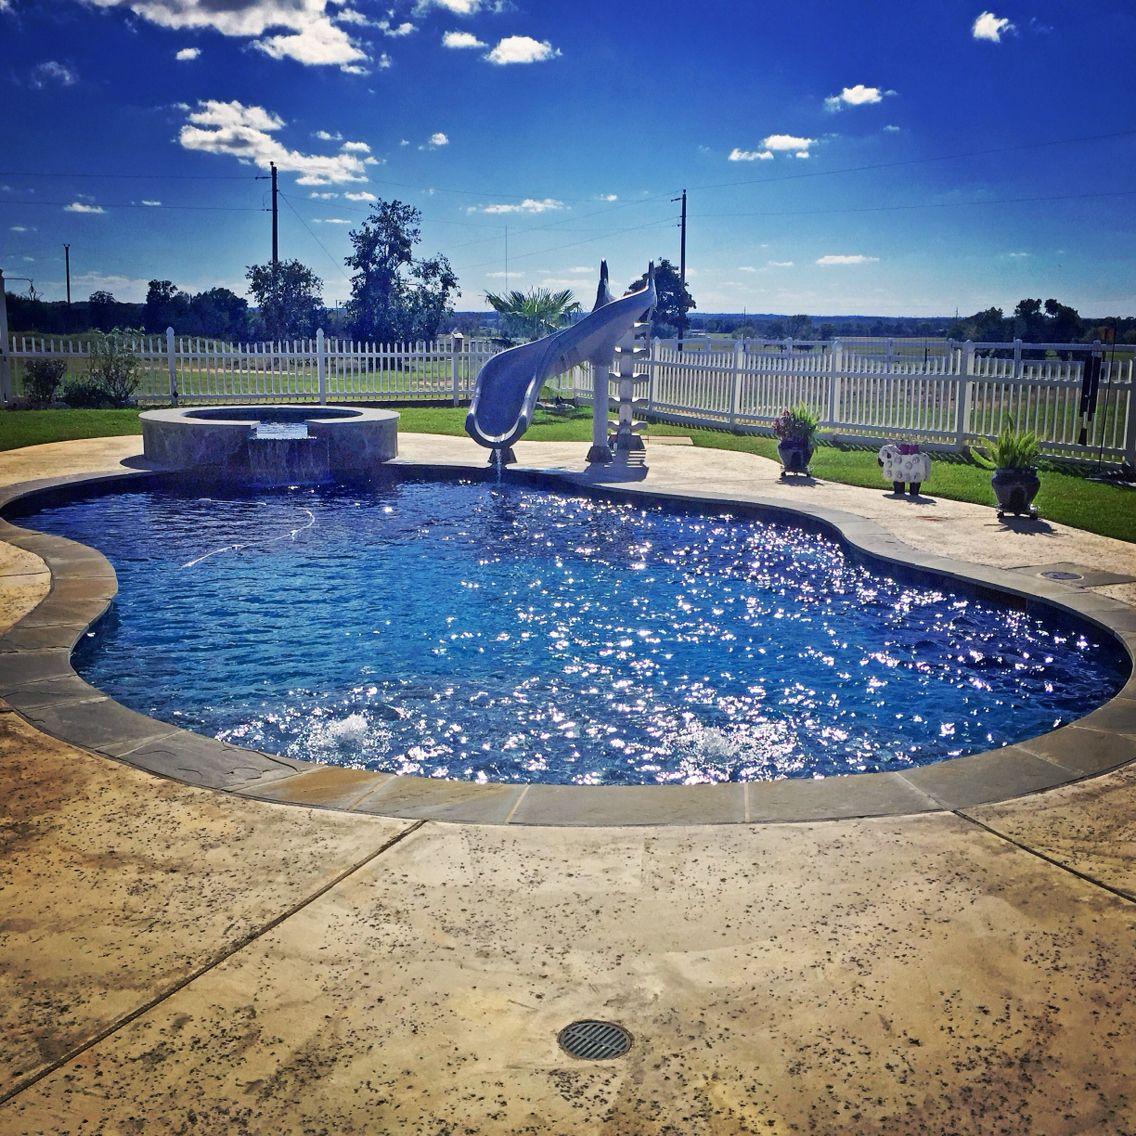 #radius #pool With #slide And #spa #hottub #flagstone #coping · Flagstone Backyard MakeoverOasisPoolsSpaConstructionBuildingSwimming ...